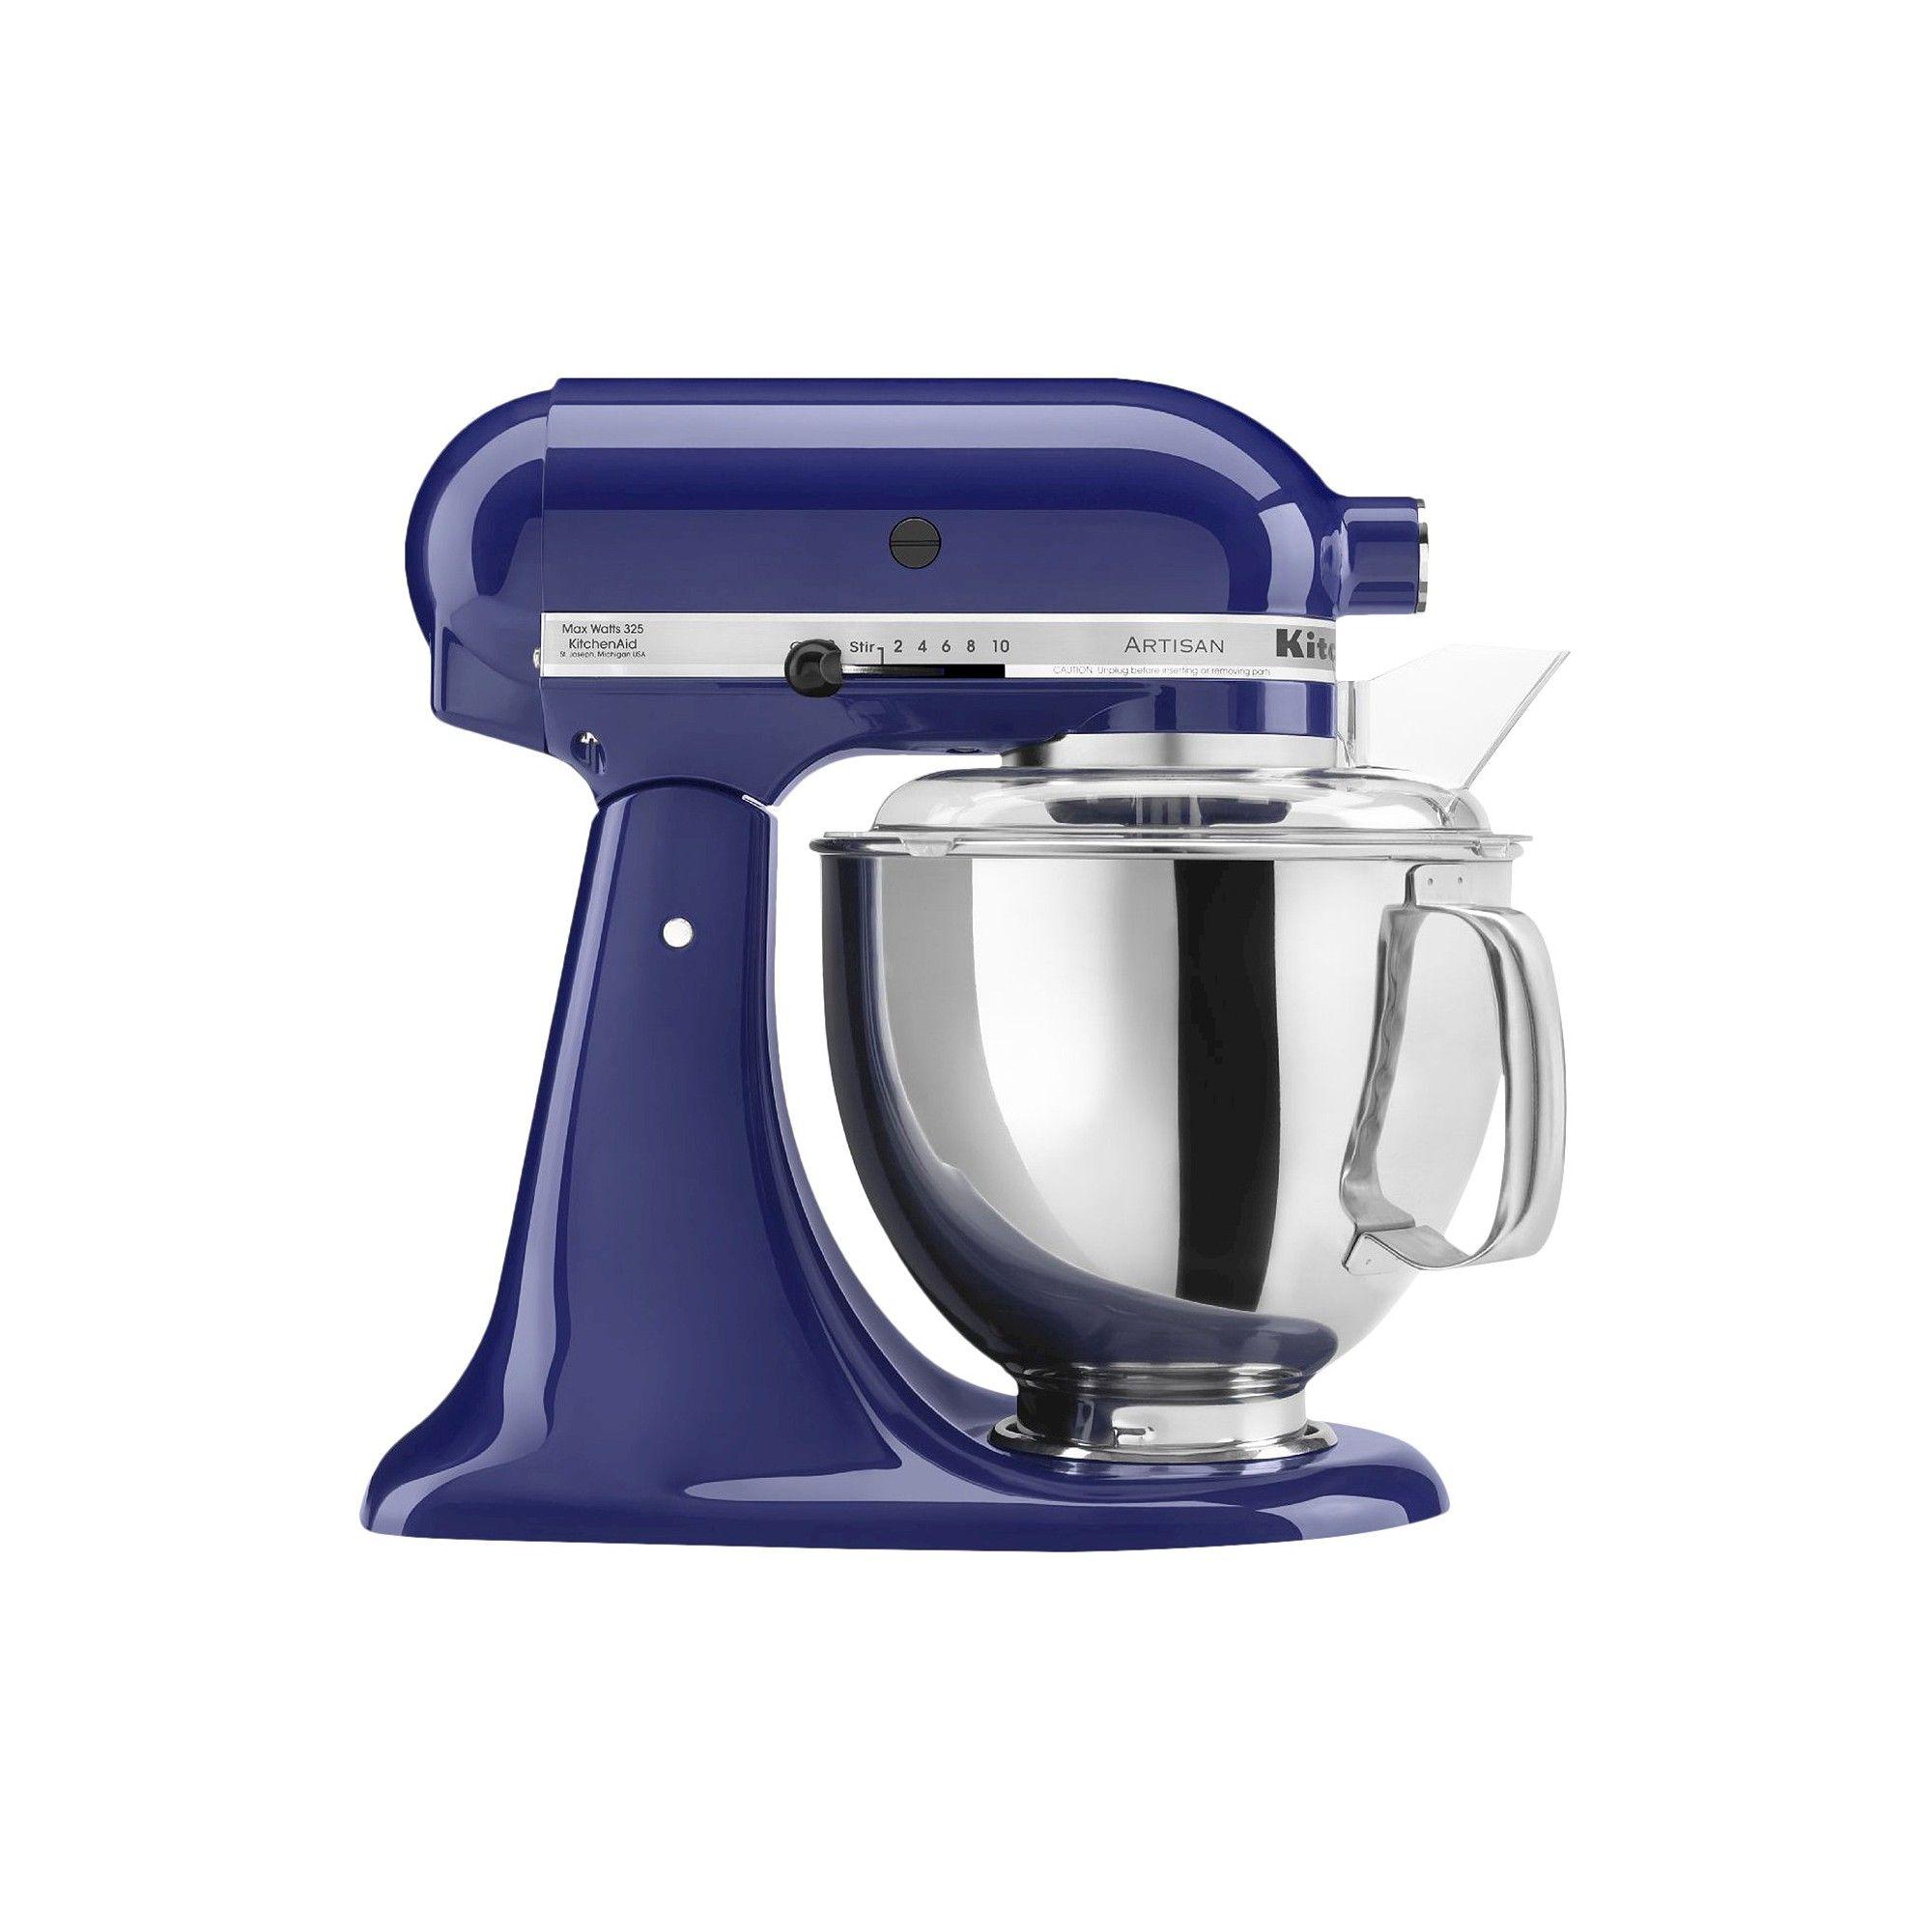 Kitchenaid¨ Artisan Series 5 Quart Tilt-Head Stand Mixer- Ksm150 ...